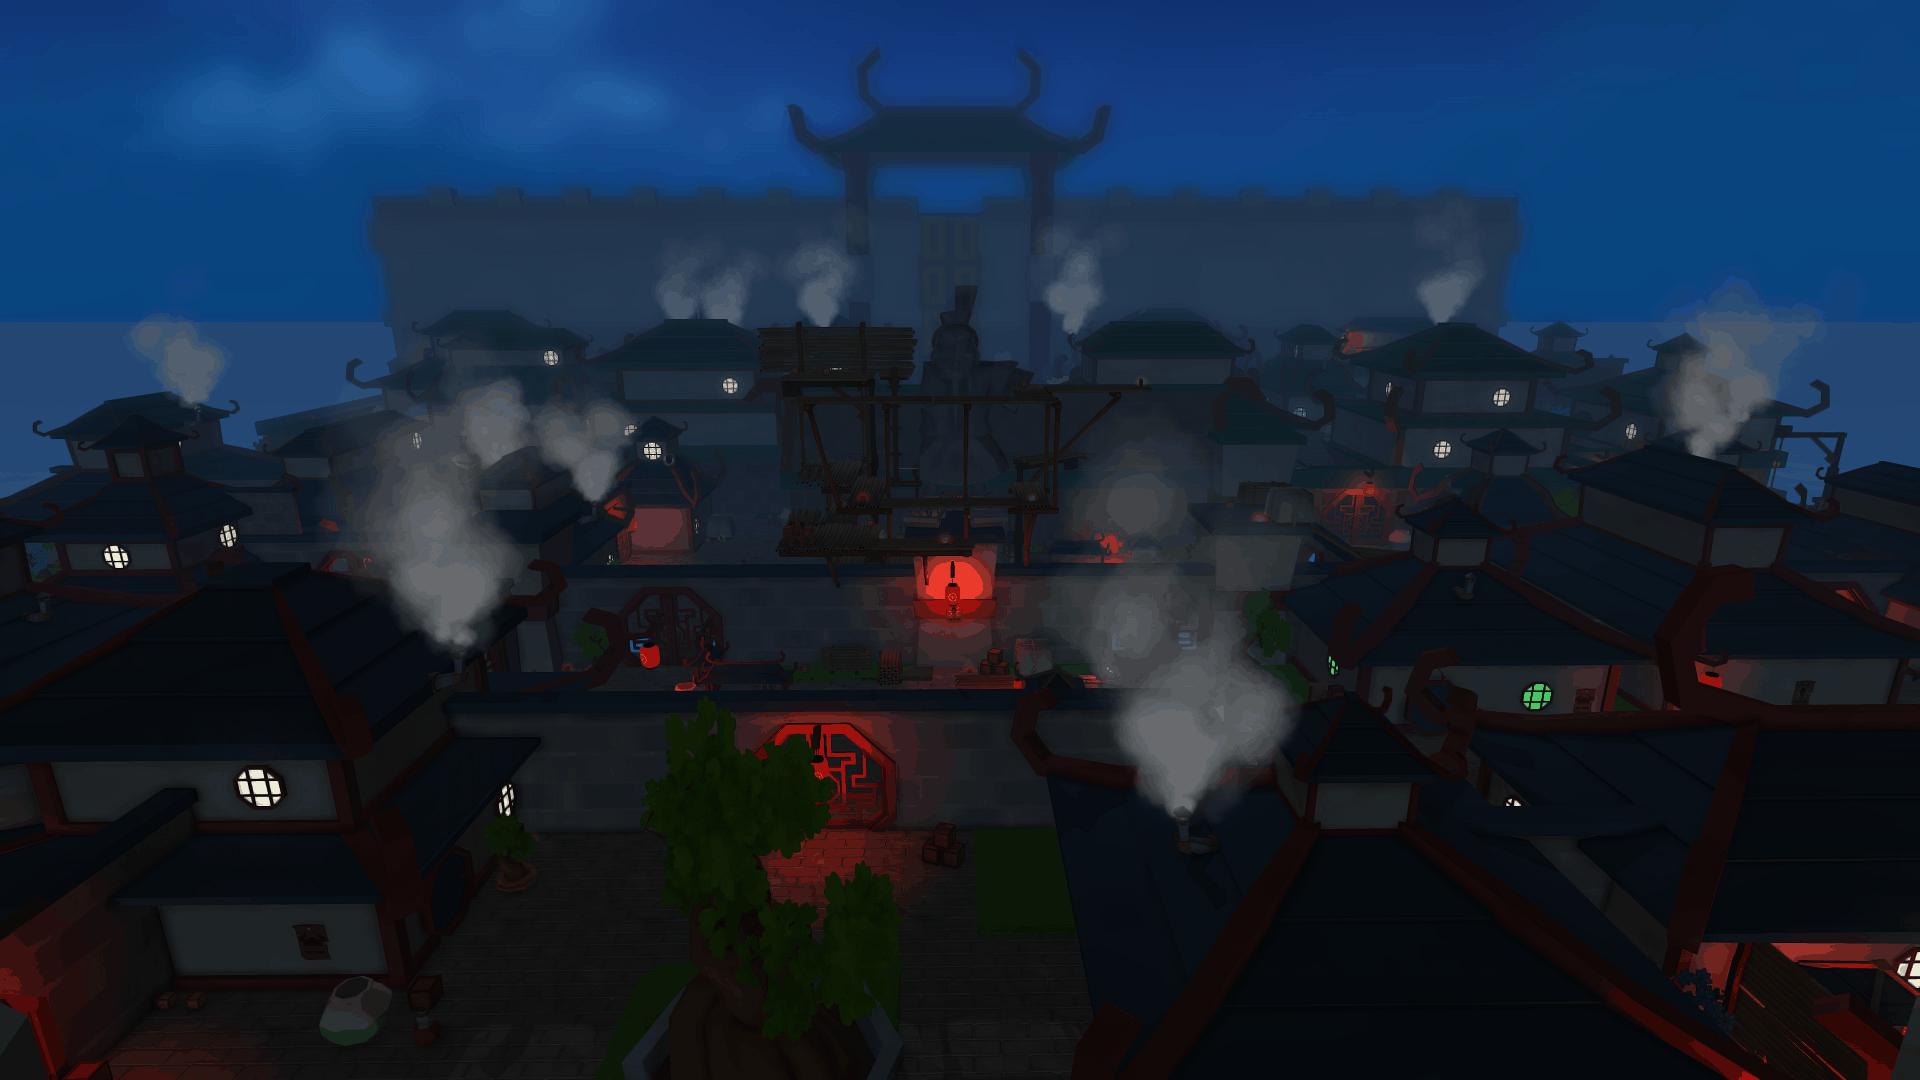 Cornerstone game screenshot, GouHai, an Asian-inspired island